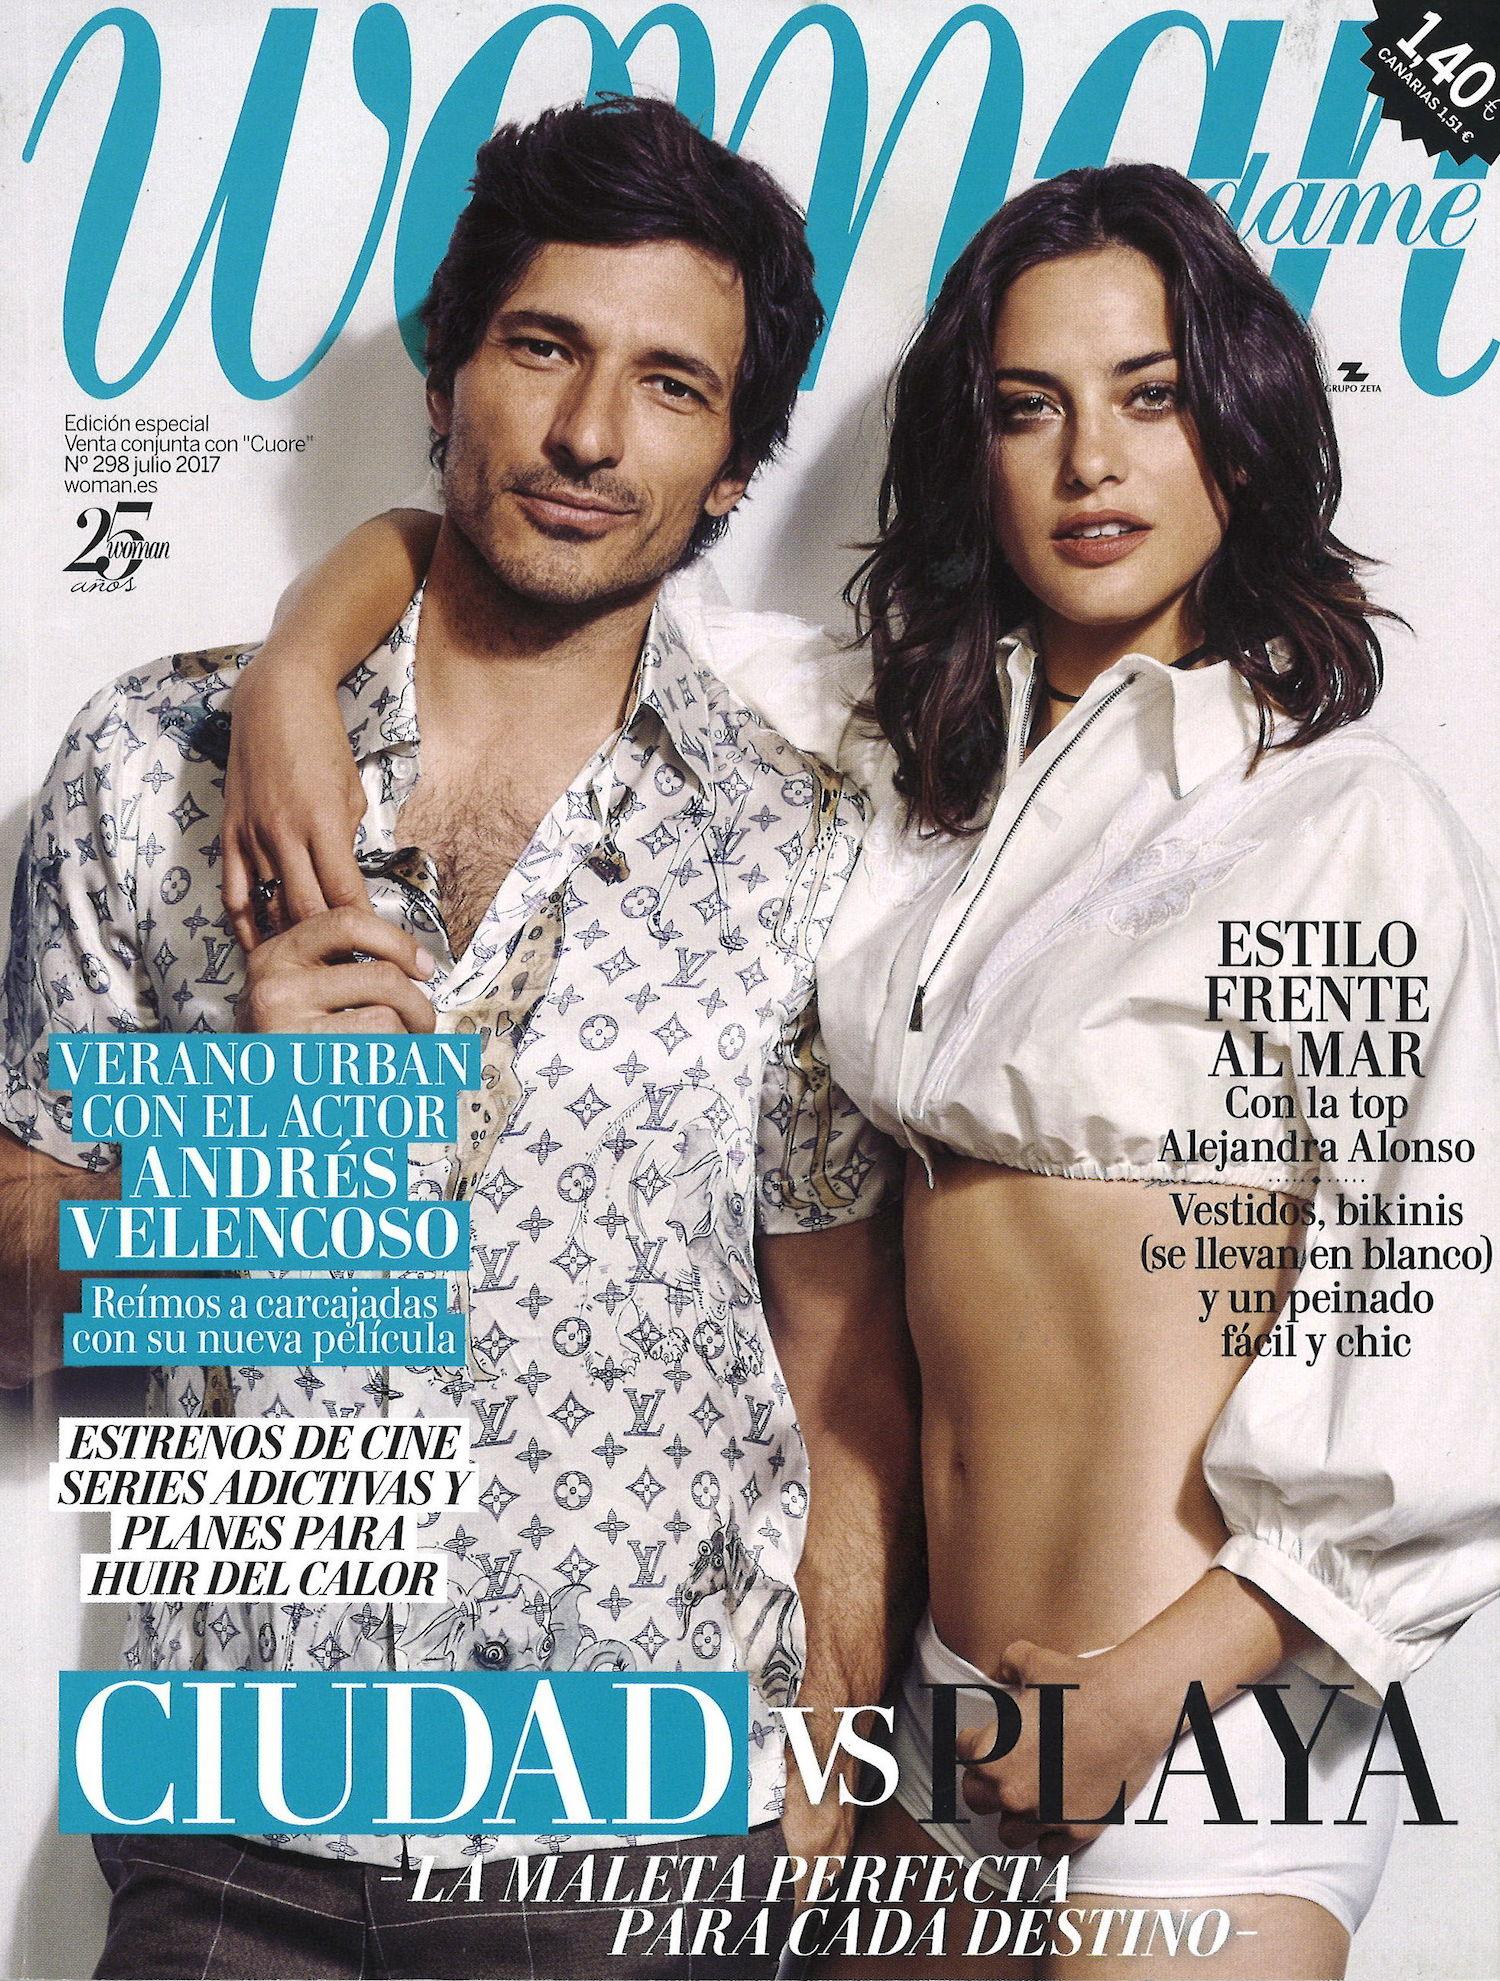 Madame Women Cover